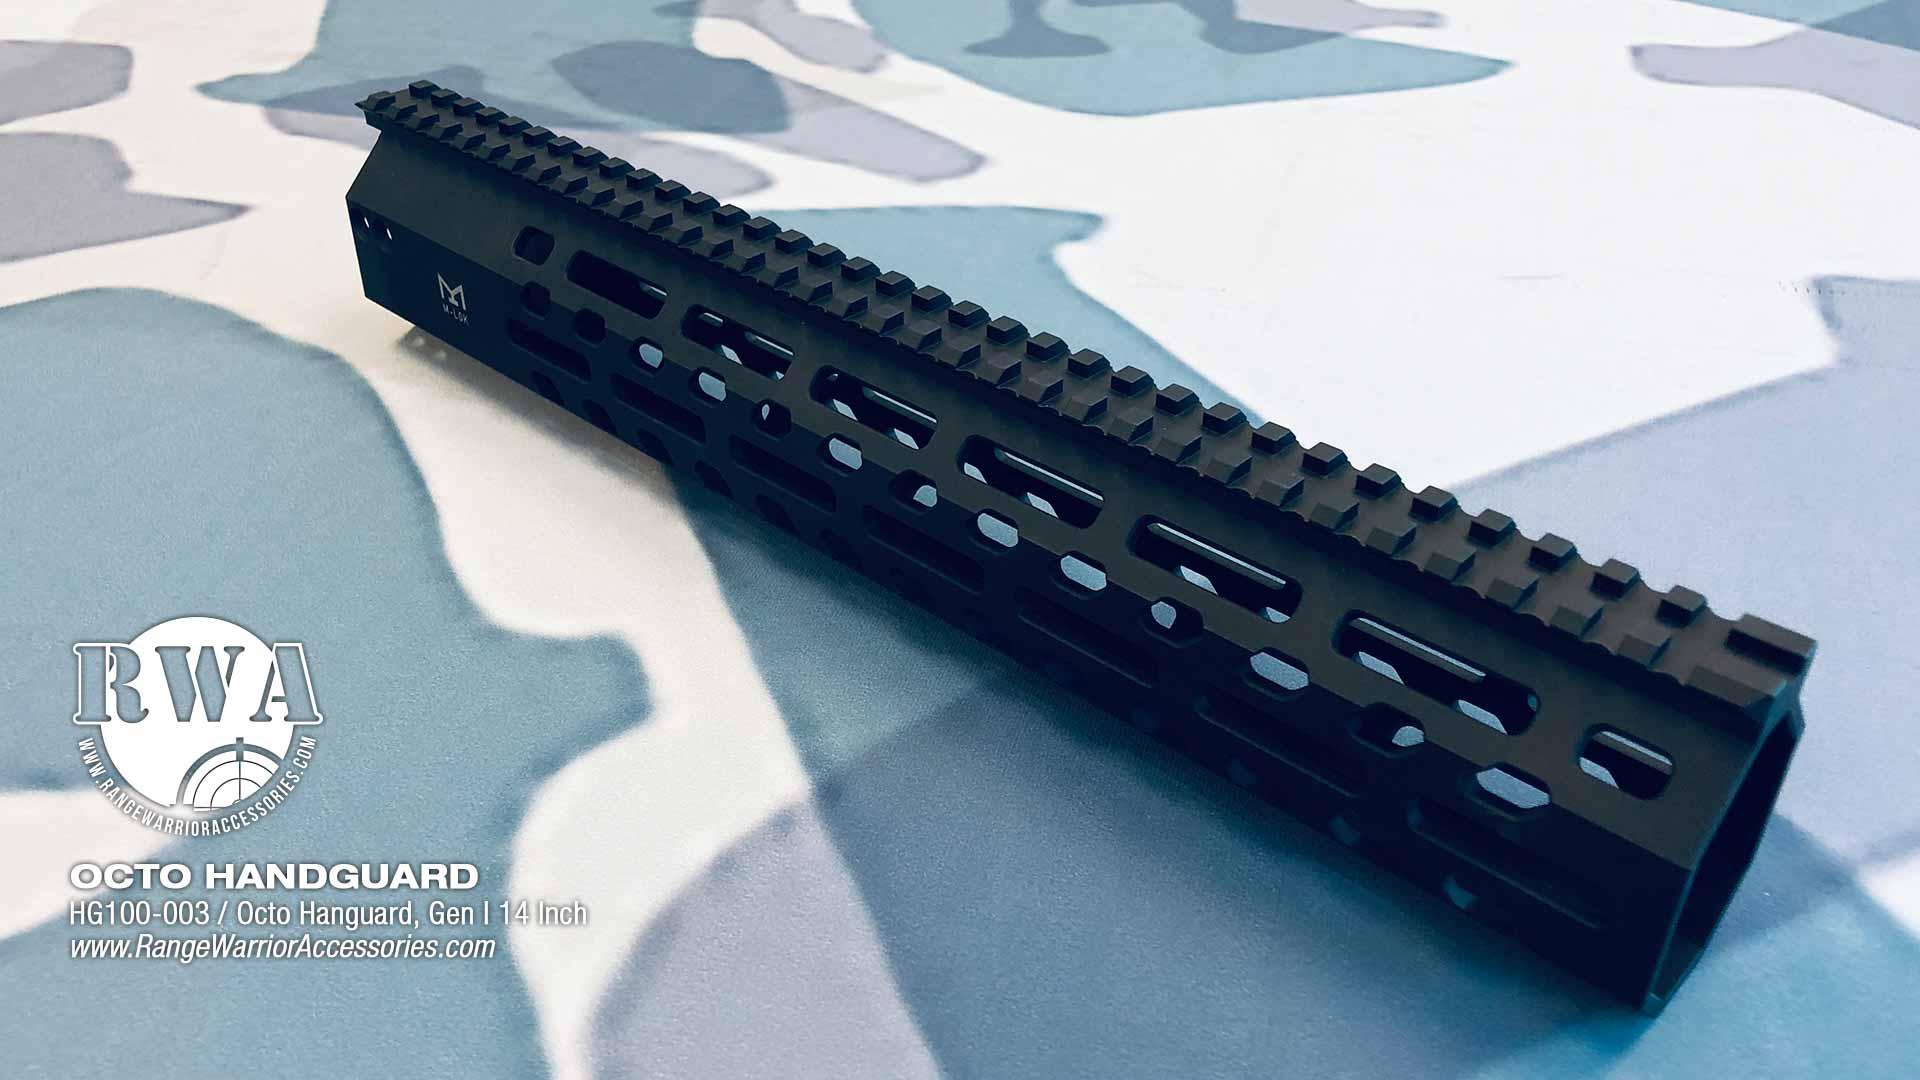 HG100-003